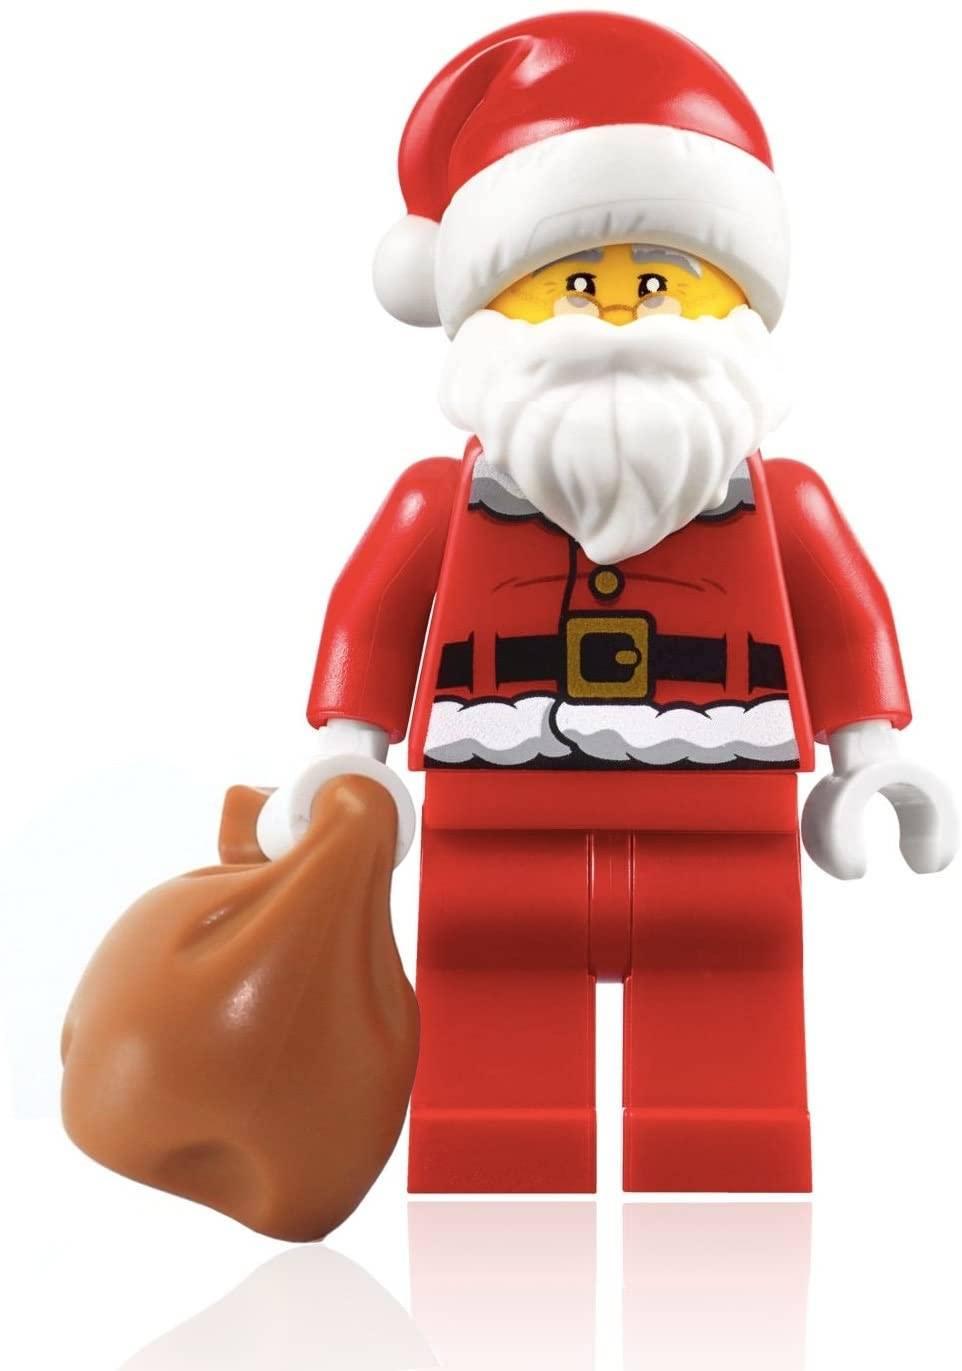 Buildable Lego Santa Figurine